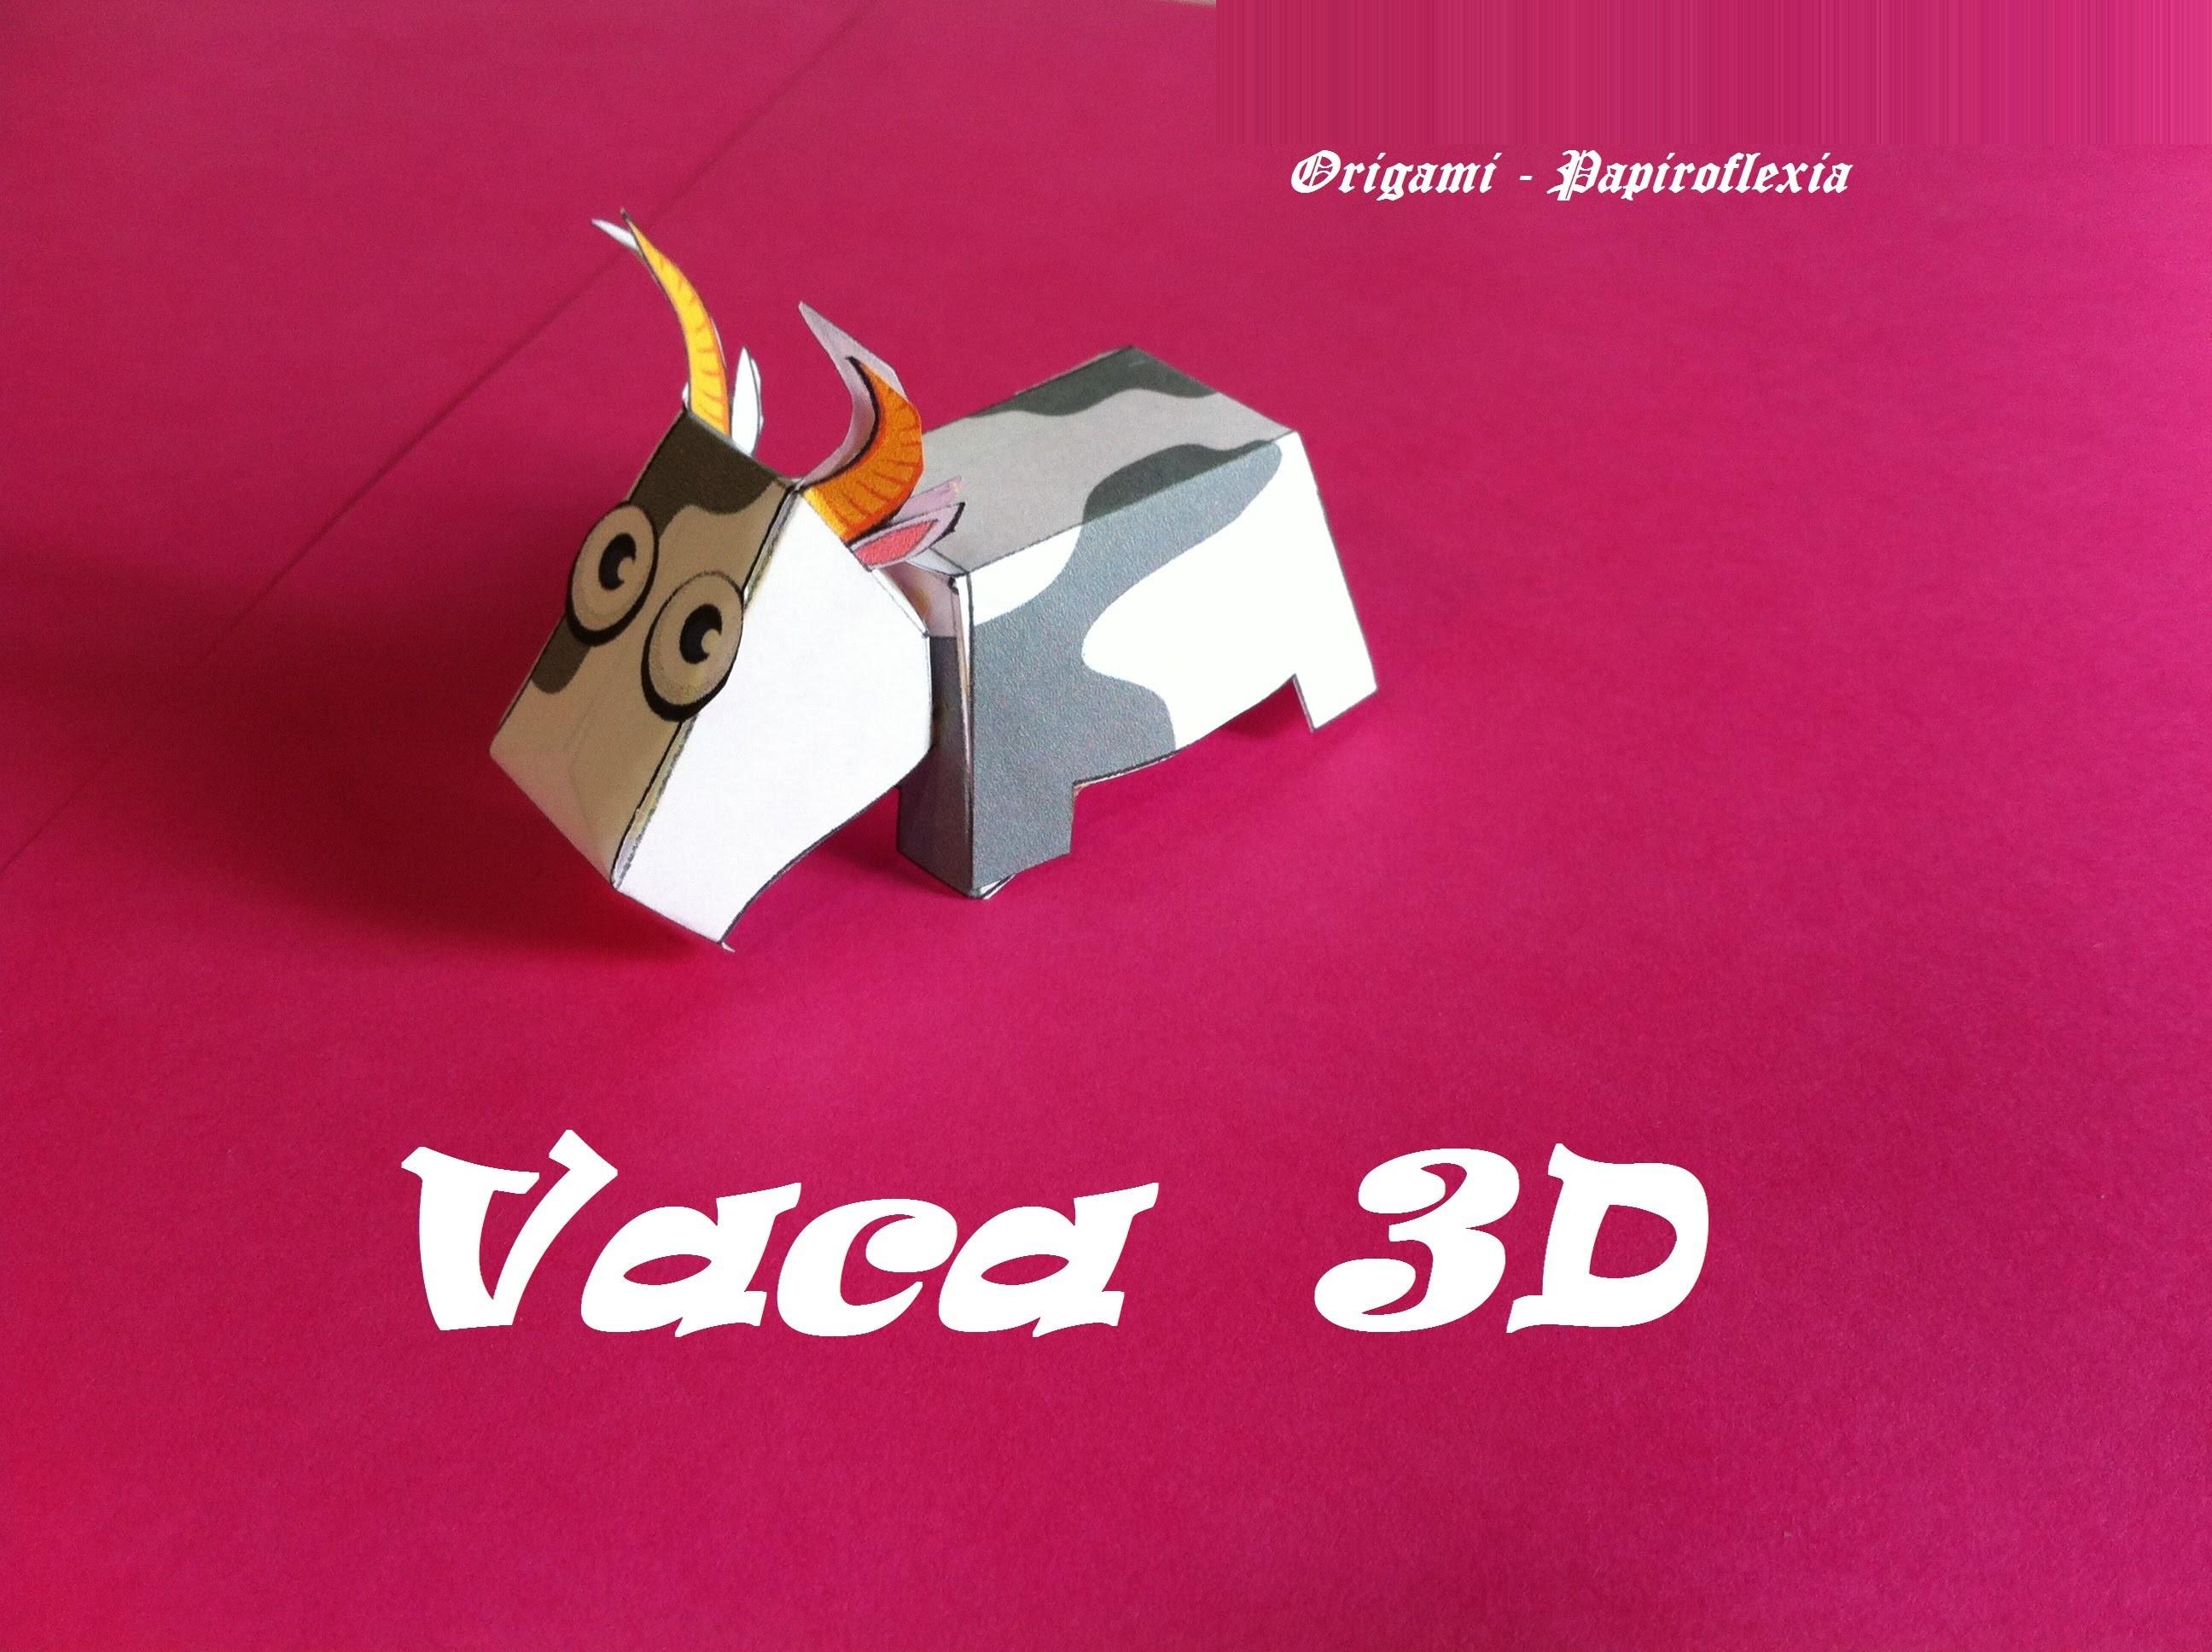 Paper Toys. Origami - Papiroflexia. Vaca 3D